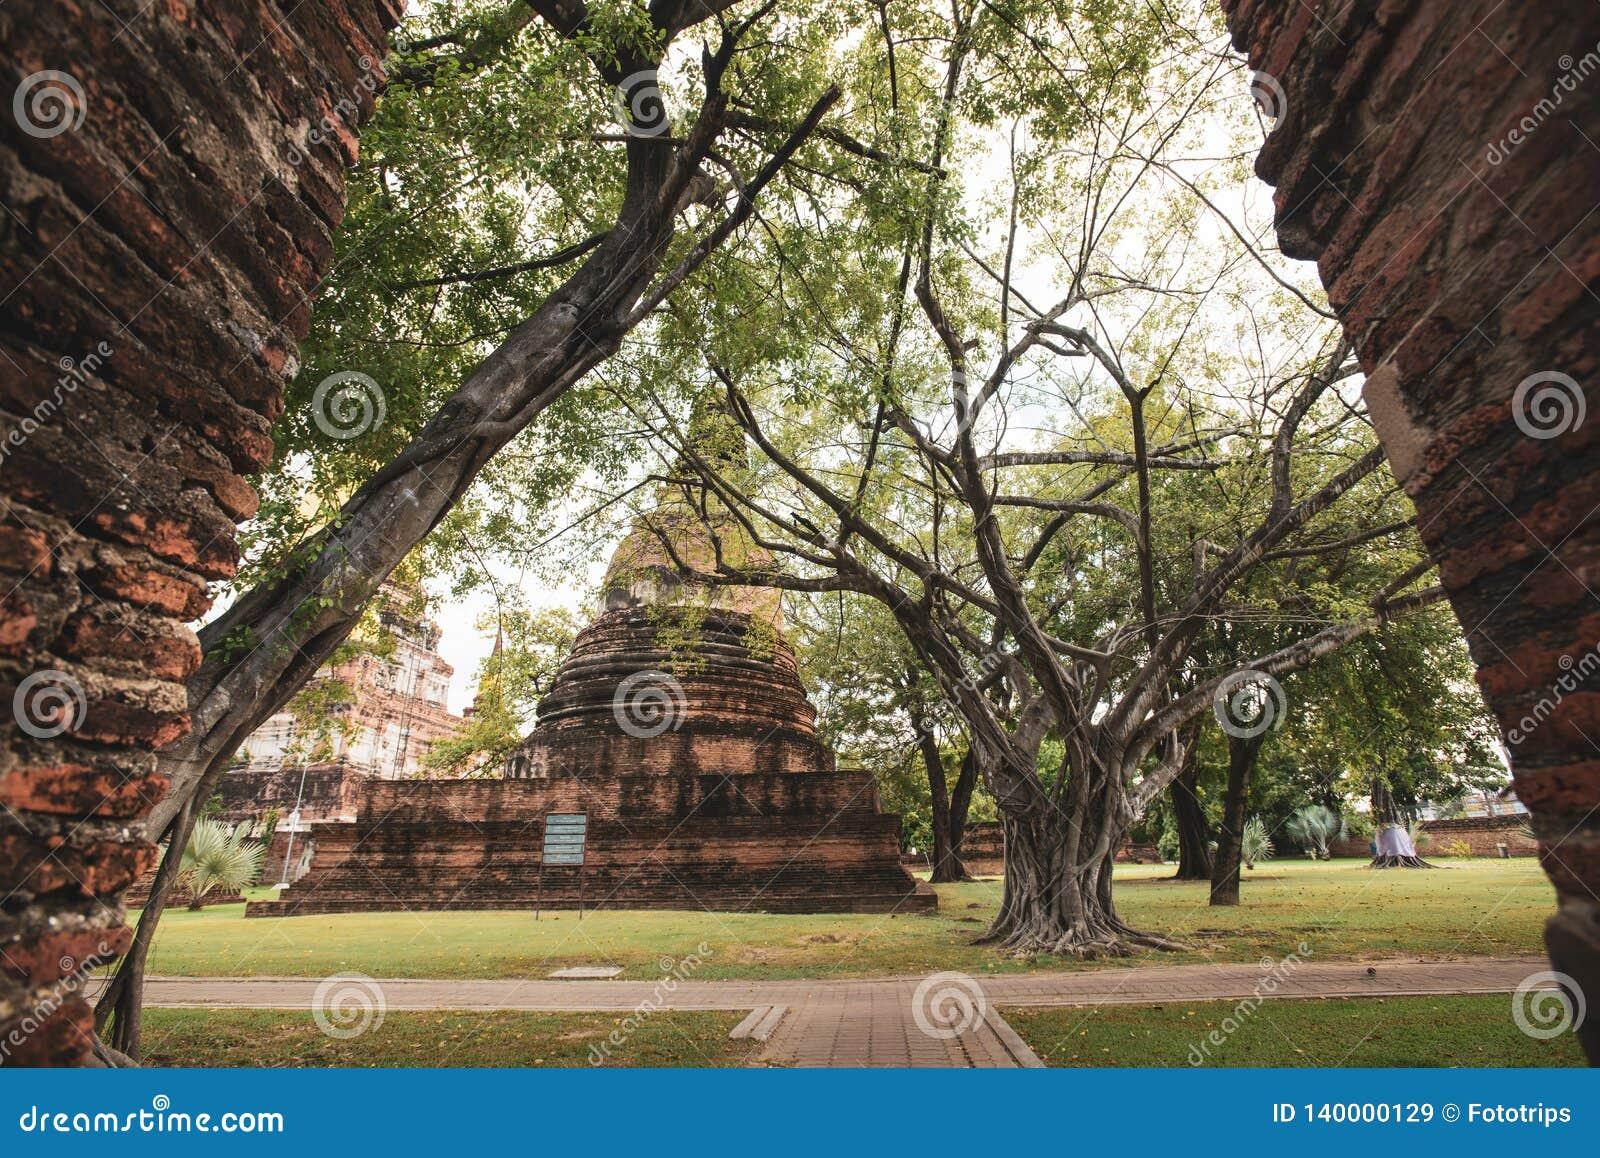 Висок Таиланда - старая пагода на Wat Yai Chai Mongkhon, парке Ayutthaya историческом, Таиланде